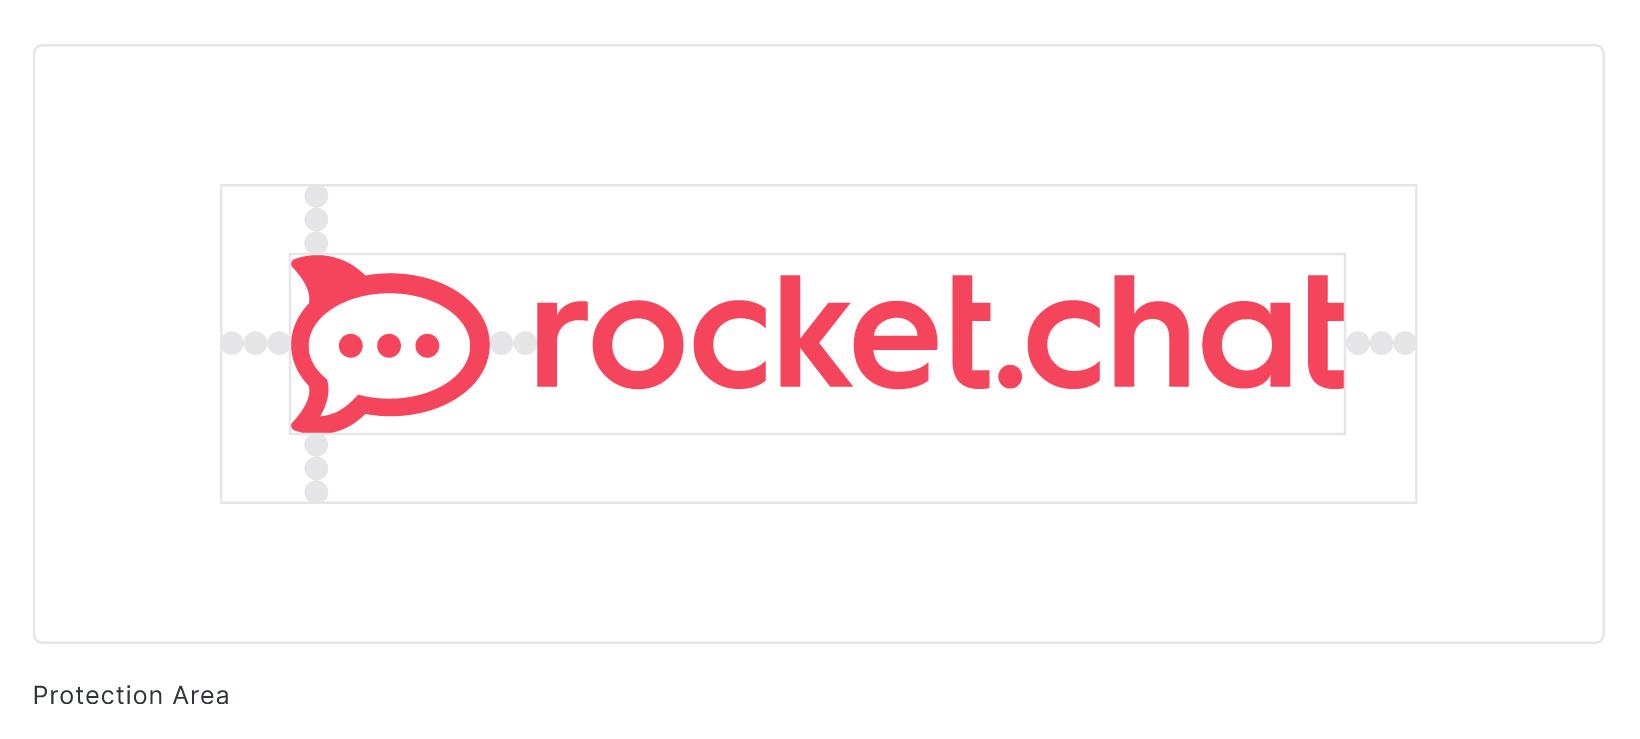 .gitbook/assets/05_logo.jpg